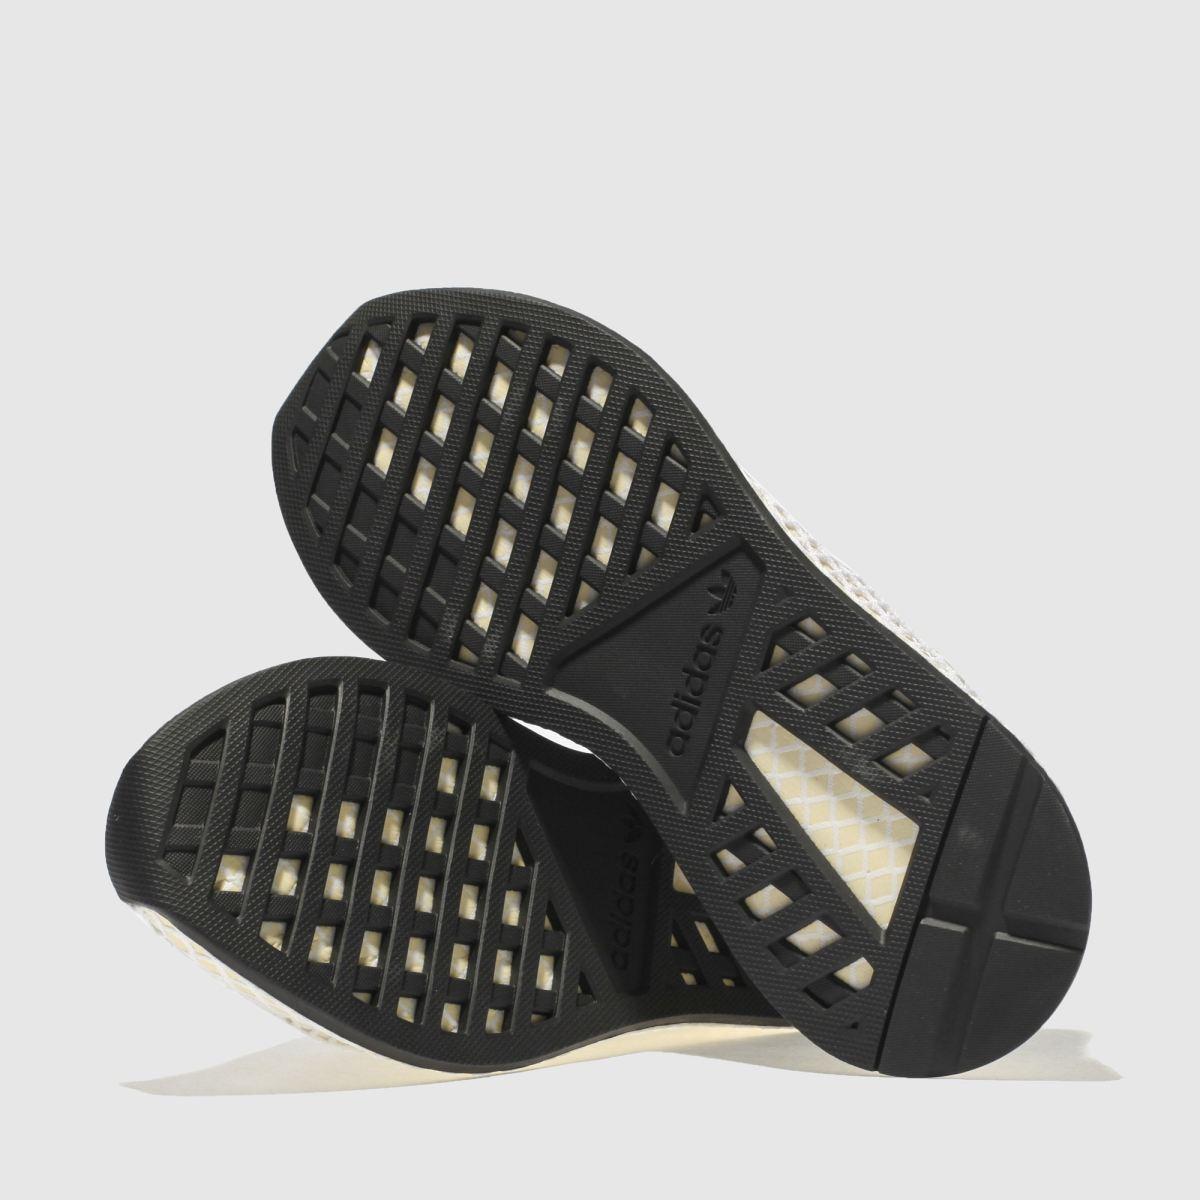 Damen Weiß-beige adidas Deerupt Runner Sneaker beliebte | schuh Gute Qualität beliebte Sneaker Schuhe 0c5cd7